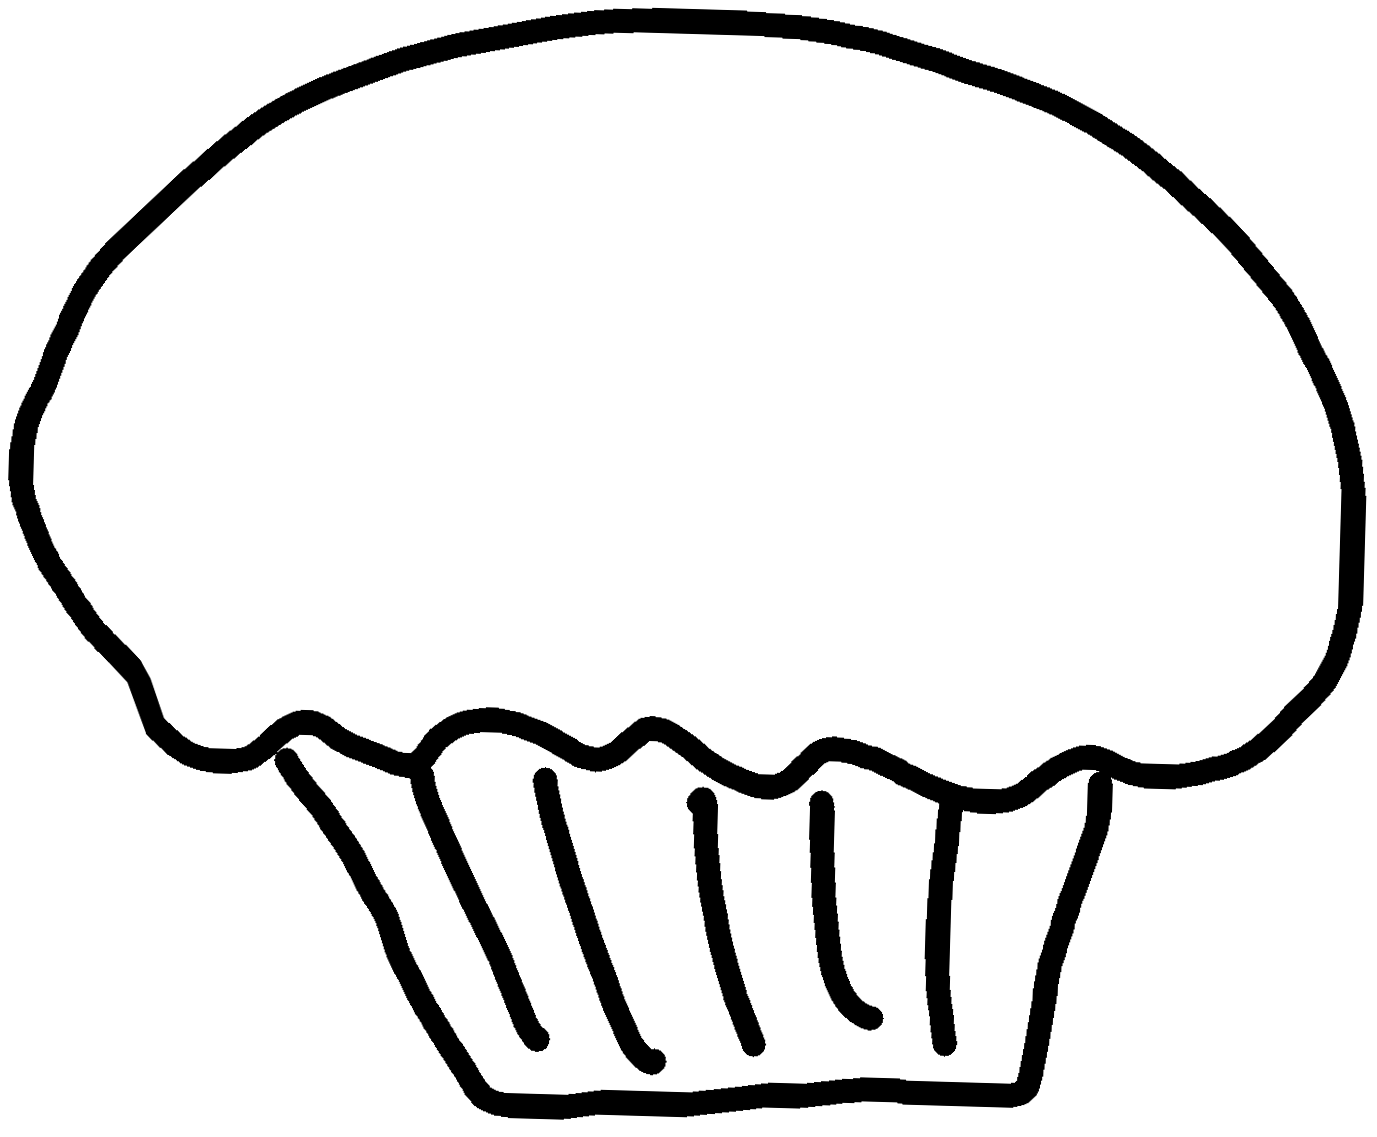 1377x1137 Watermelon Slice Clipart Black And White